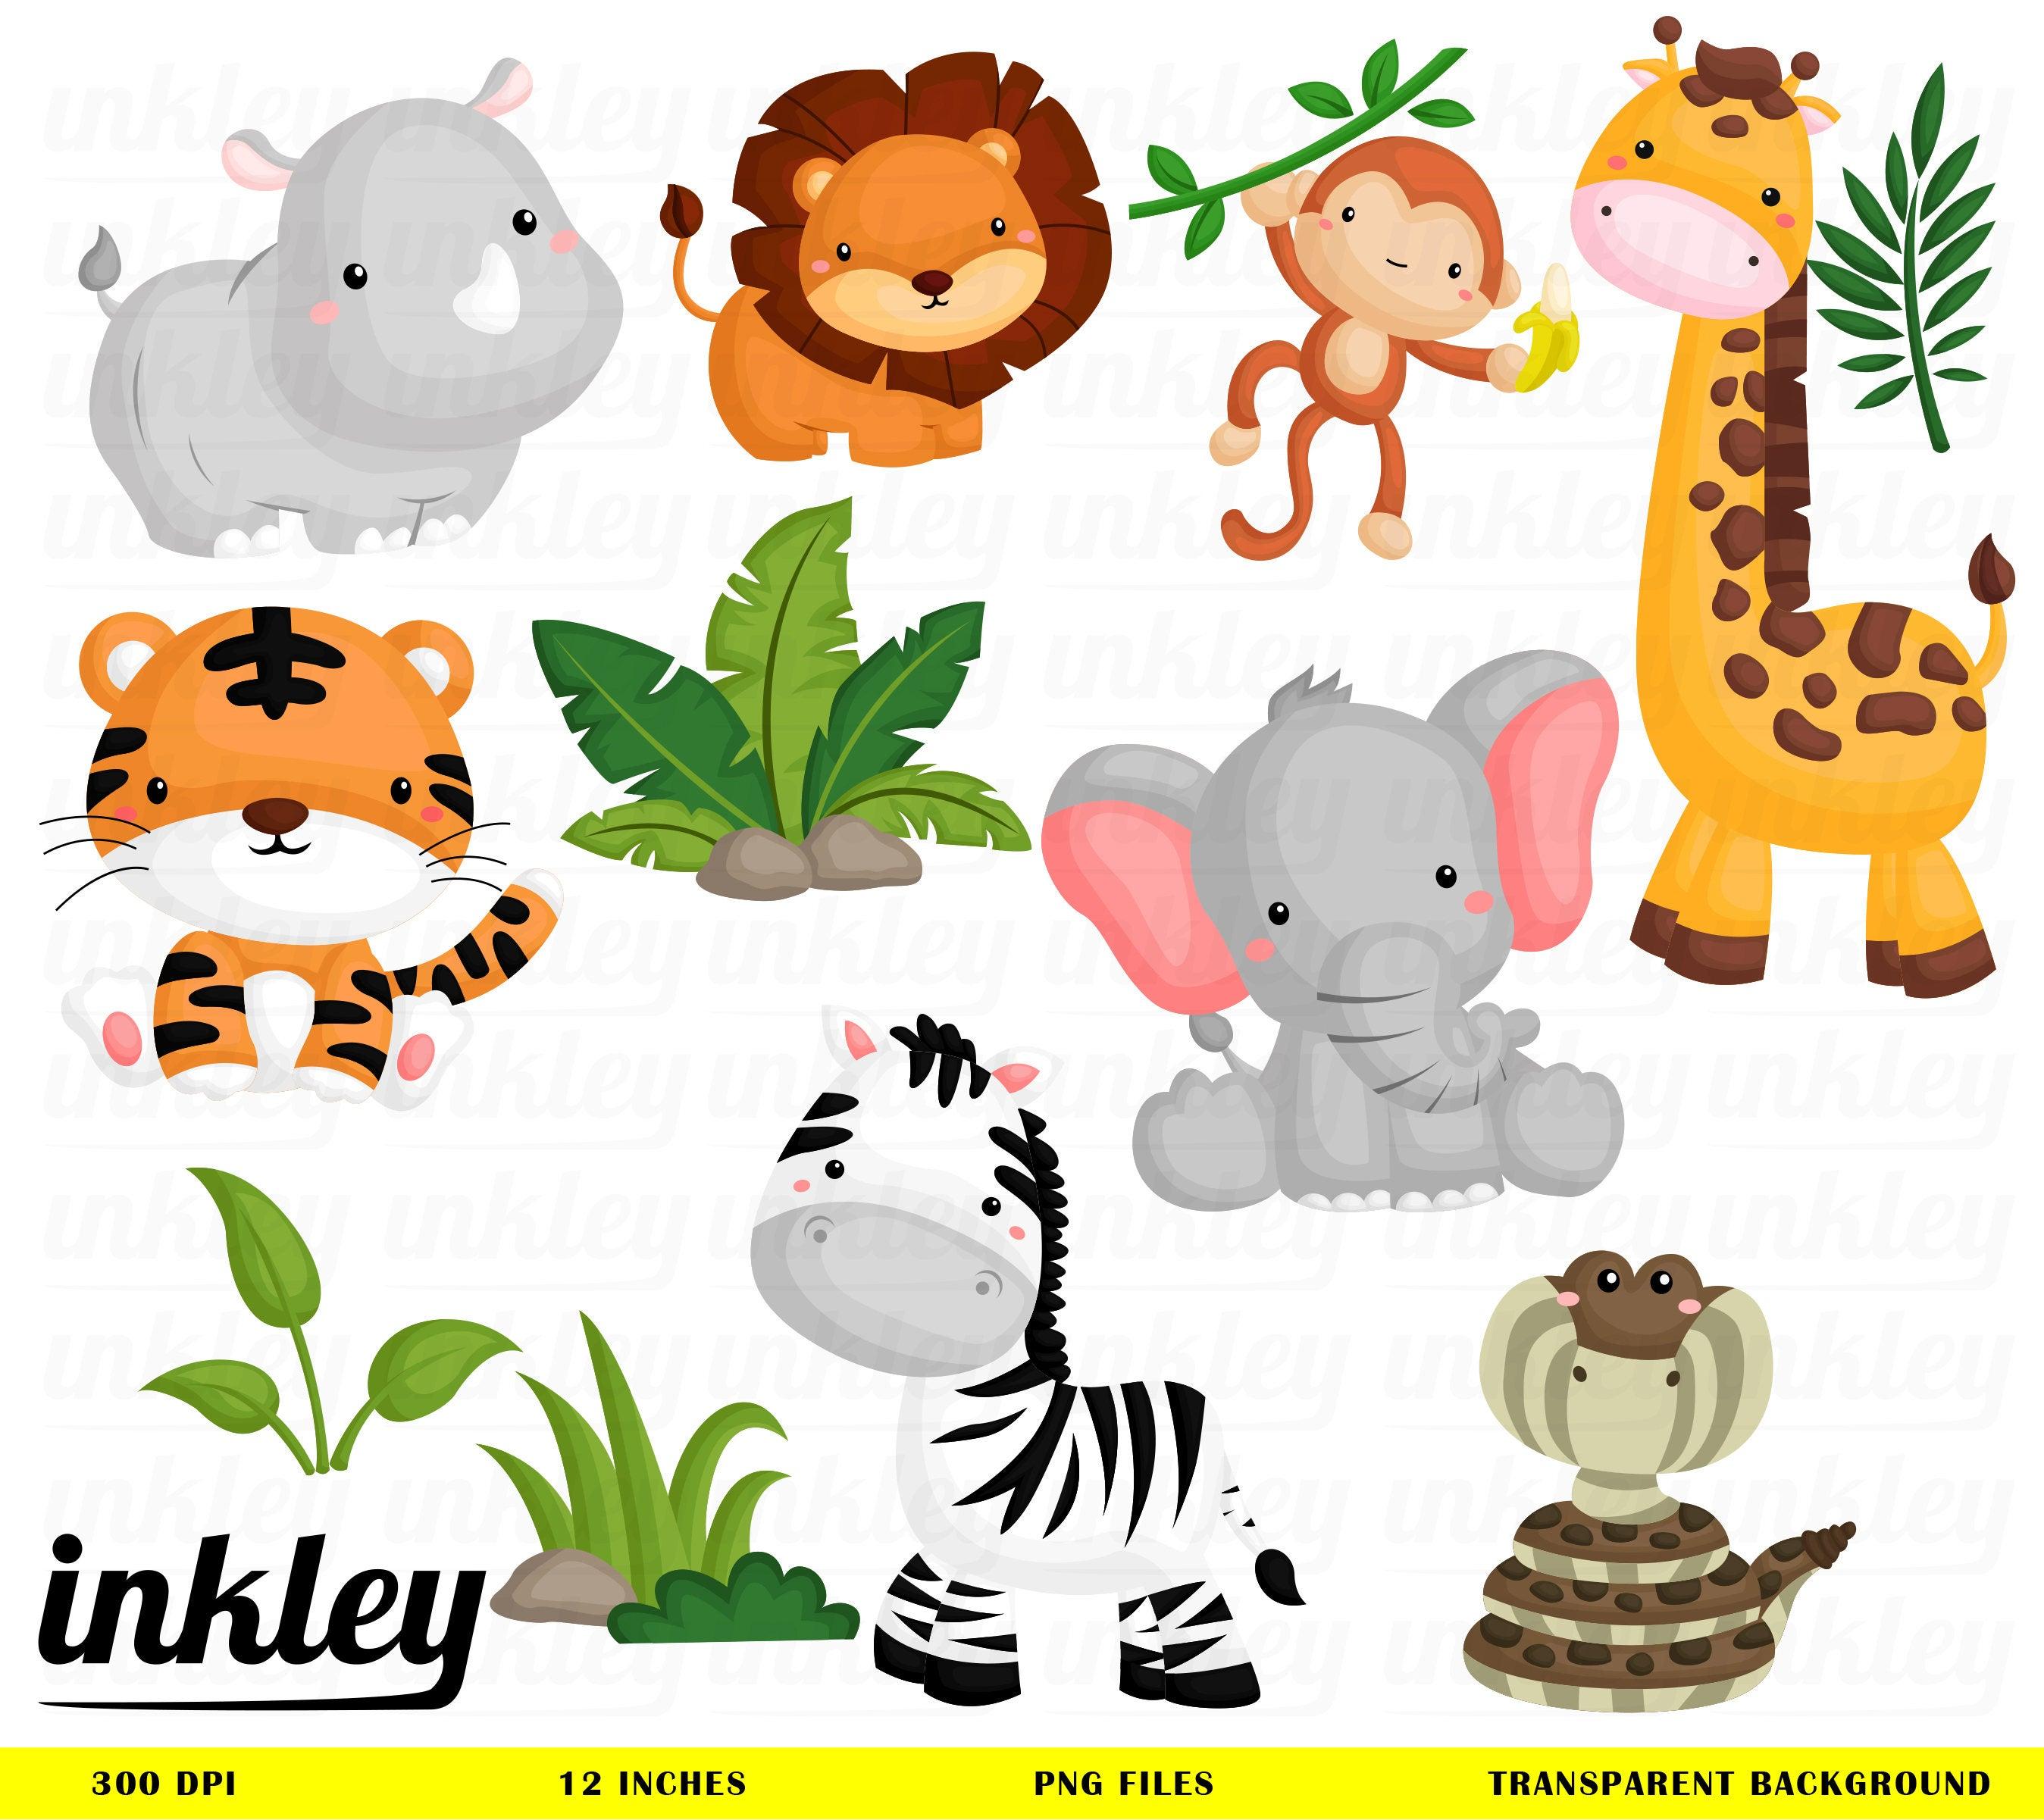 Jungle Animal Clipart,Jungle Clip Art, Jungle Animal Png, Animal Clipart,  Forest Clipart, Snake Clipart, Digital Clipart, Zebra Clipart.